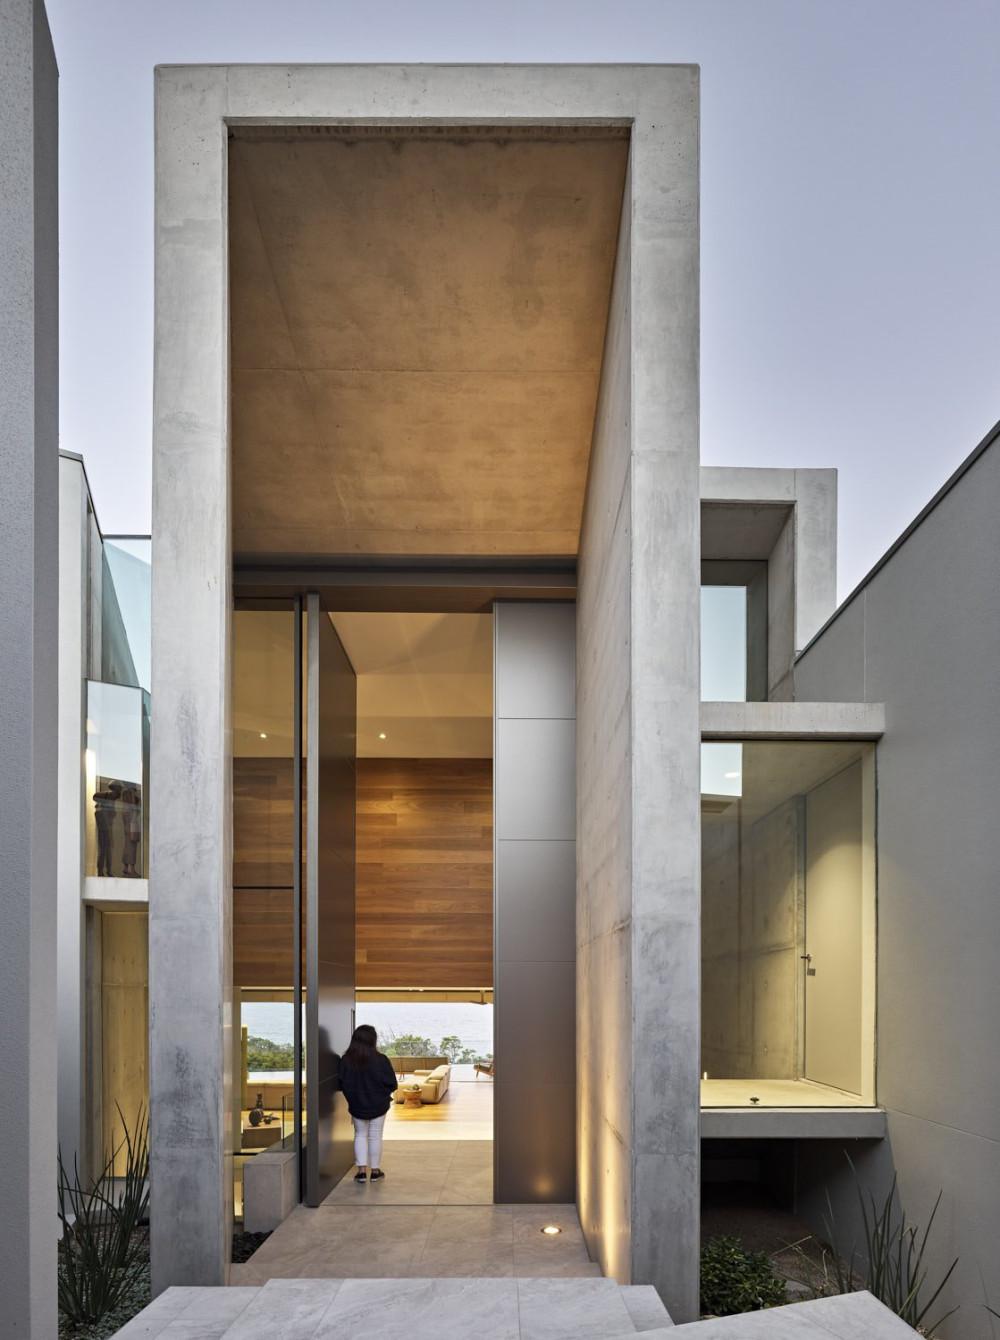 Architecture-by-Gavin-Maddock-pivot-door-by-Australian-Metal-Craft-With-FritsJurgens-pivot-hinge-system-M.jpg